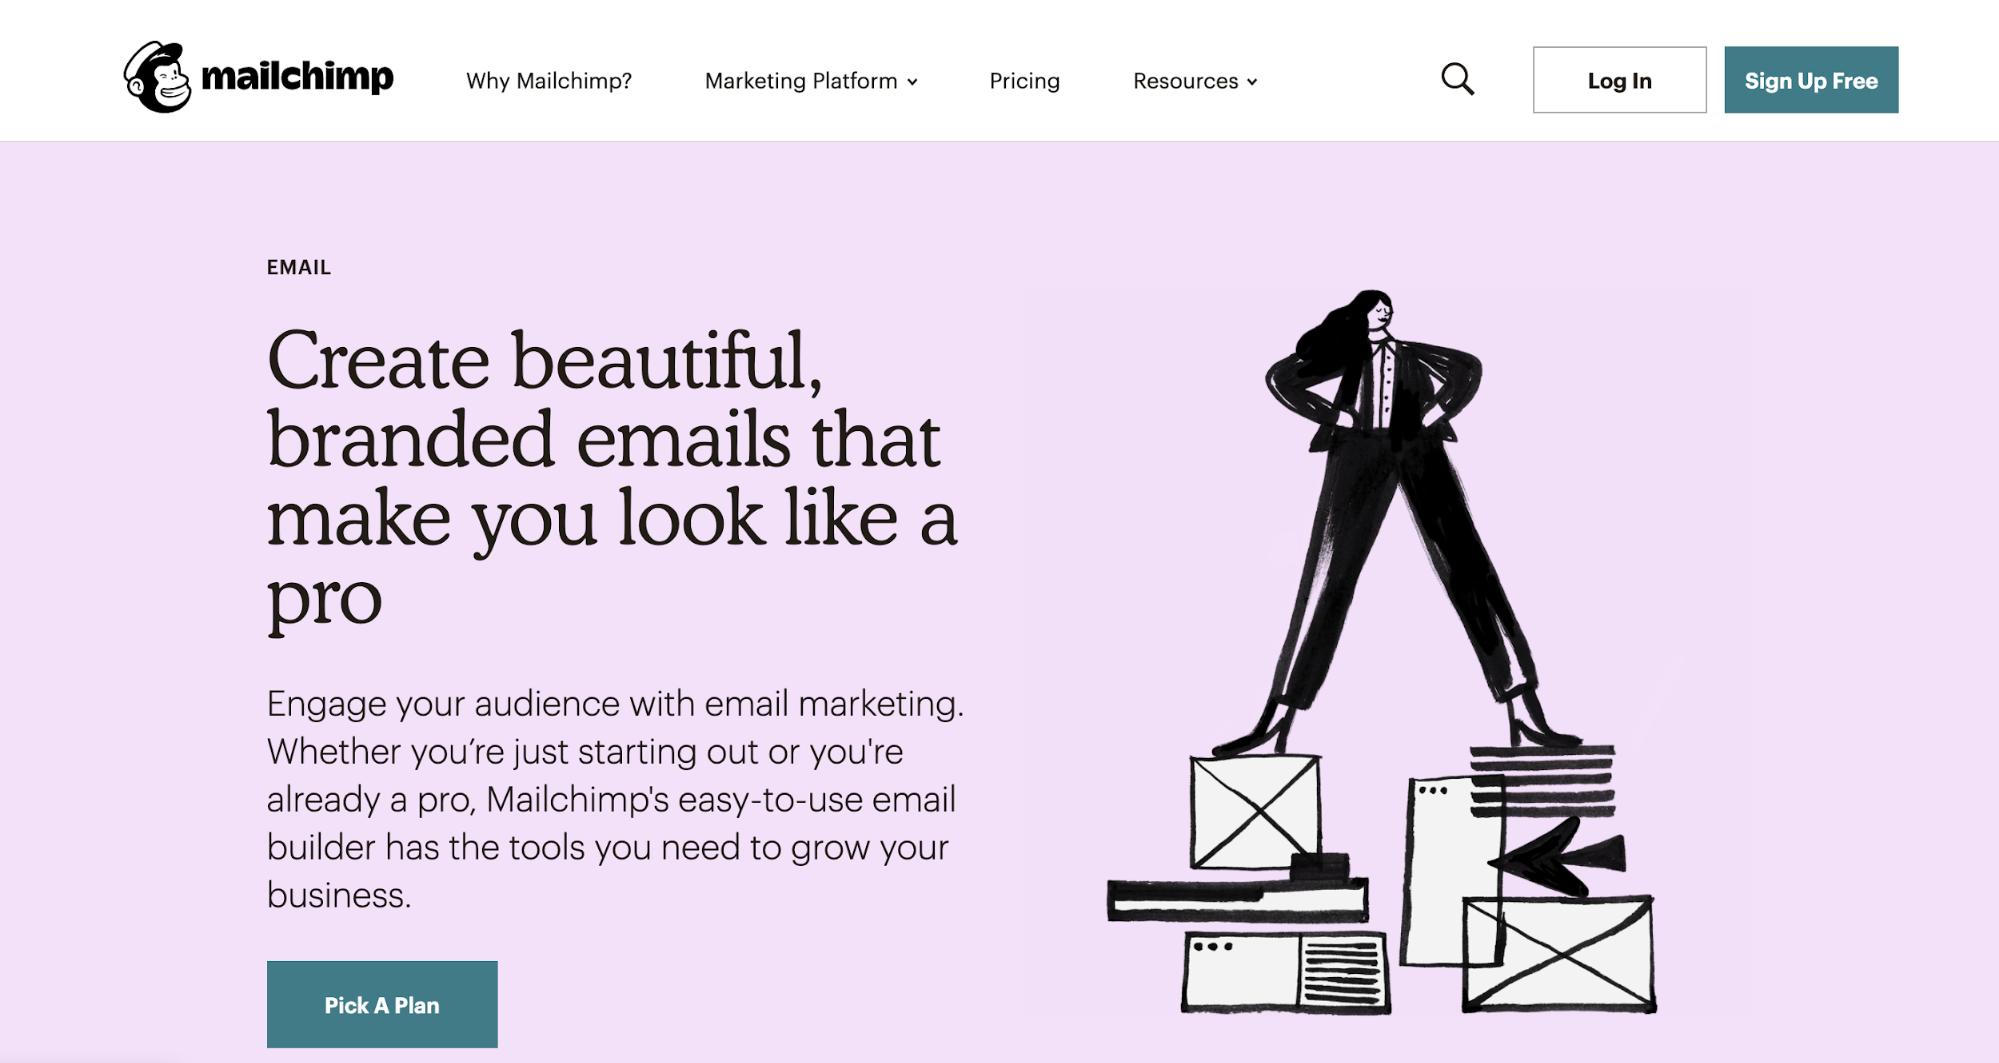 B2B Marketing Platforms